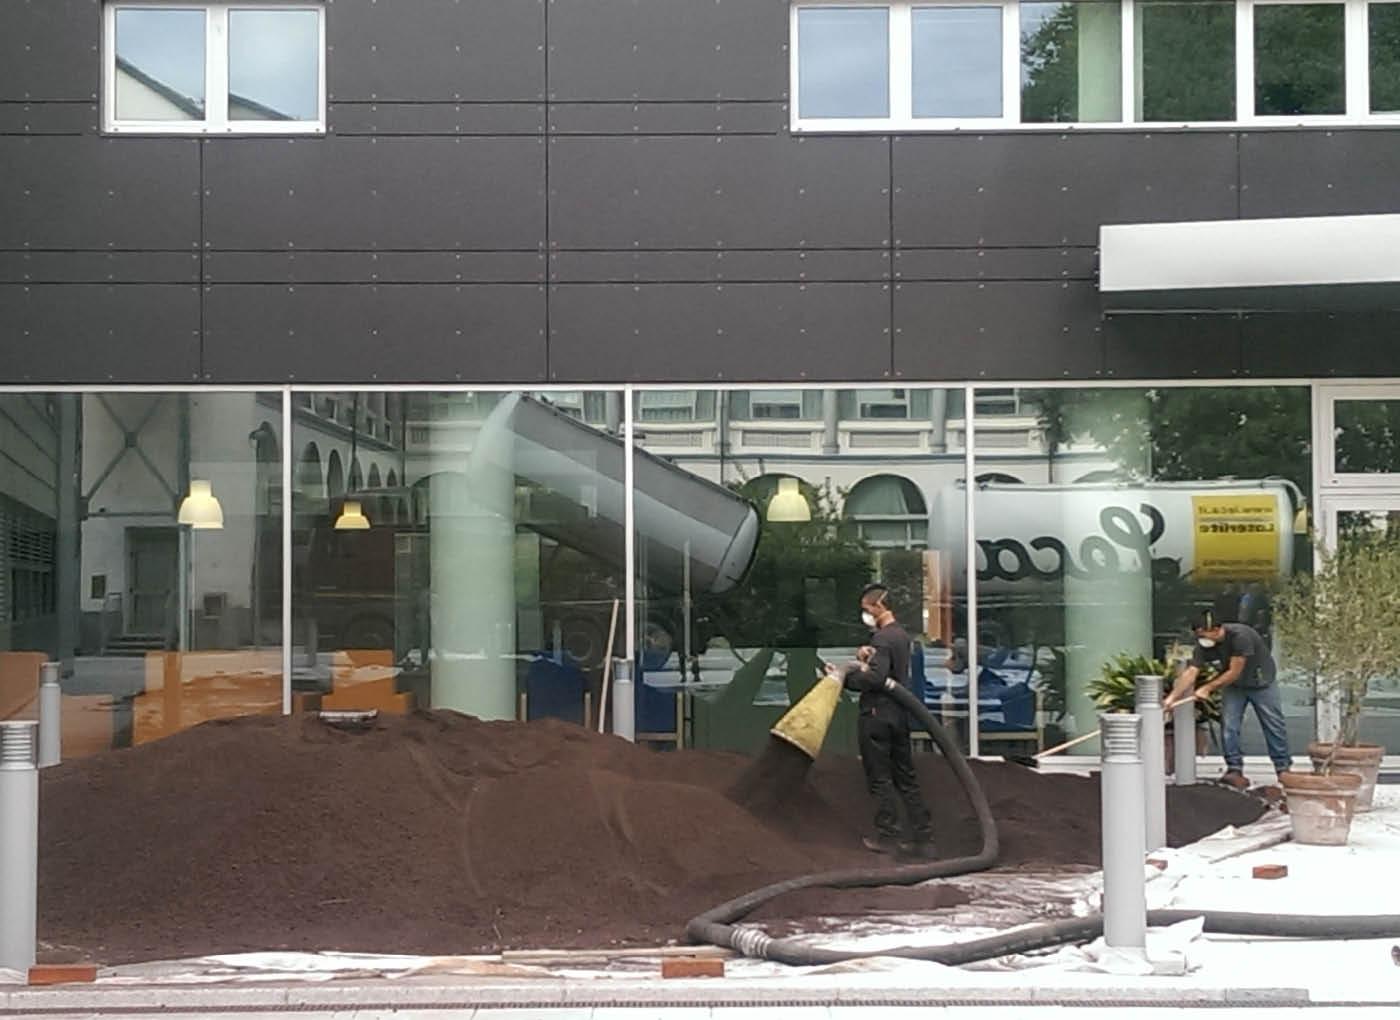 istituto-golgi-radaelli-abbiategrasso-tetto-verde-lecagreen-3